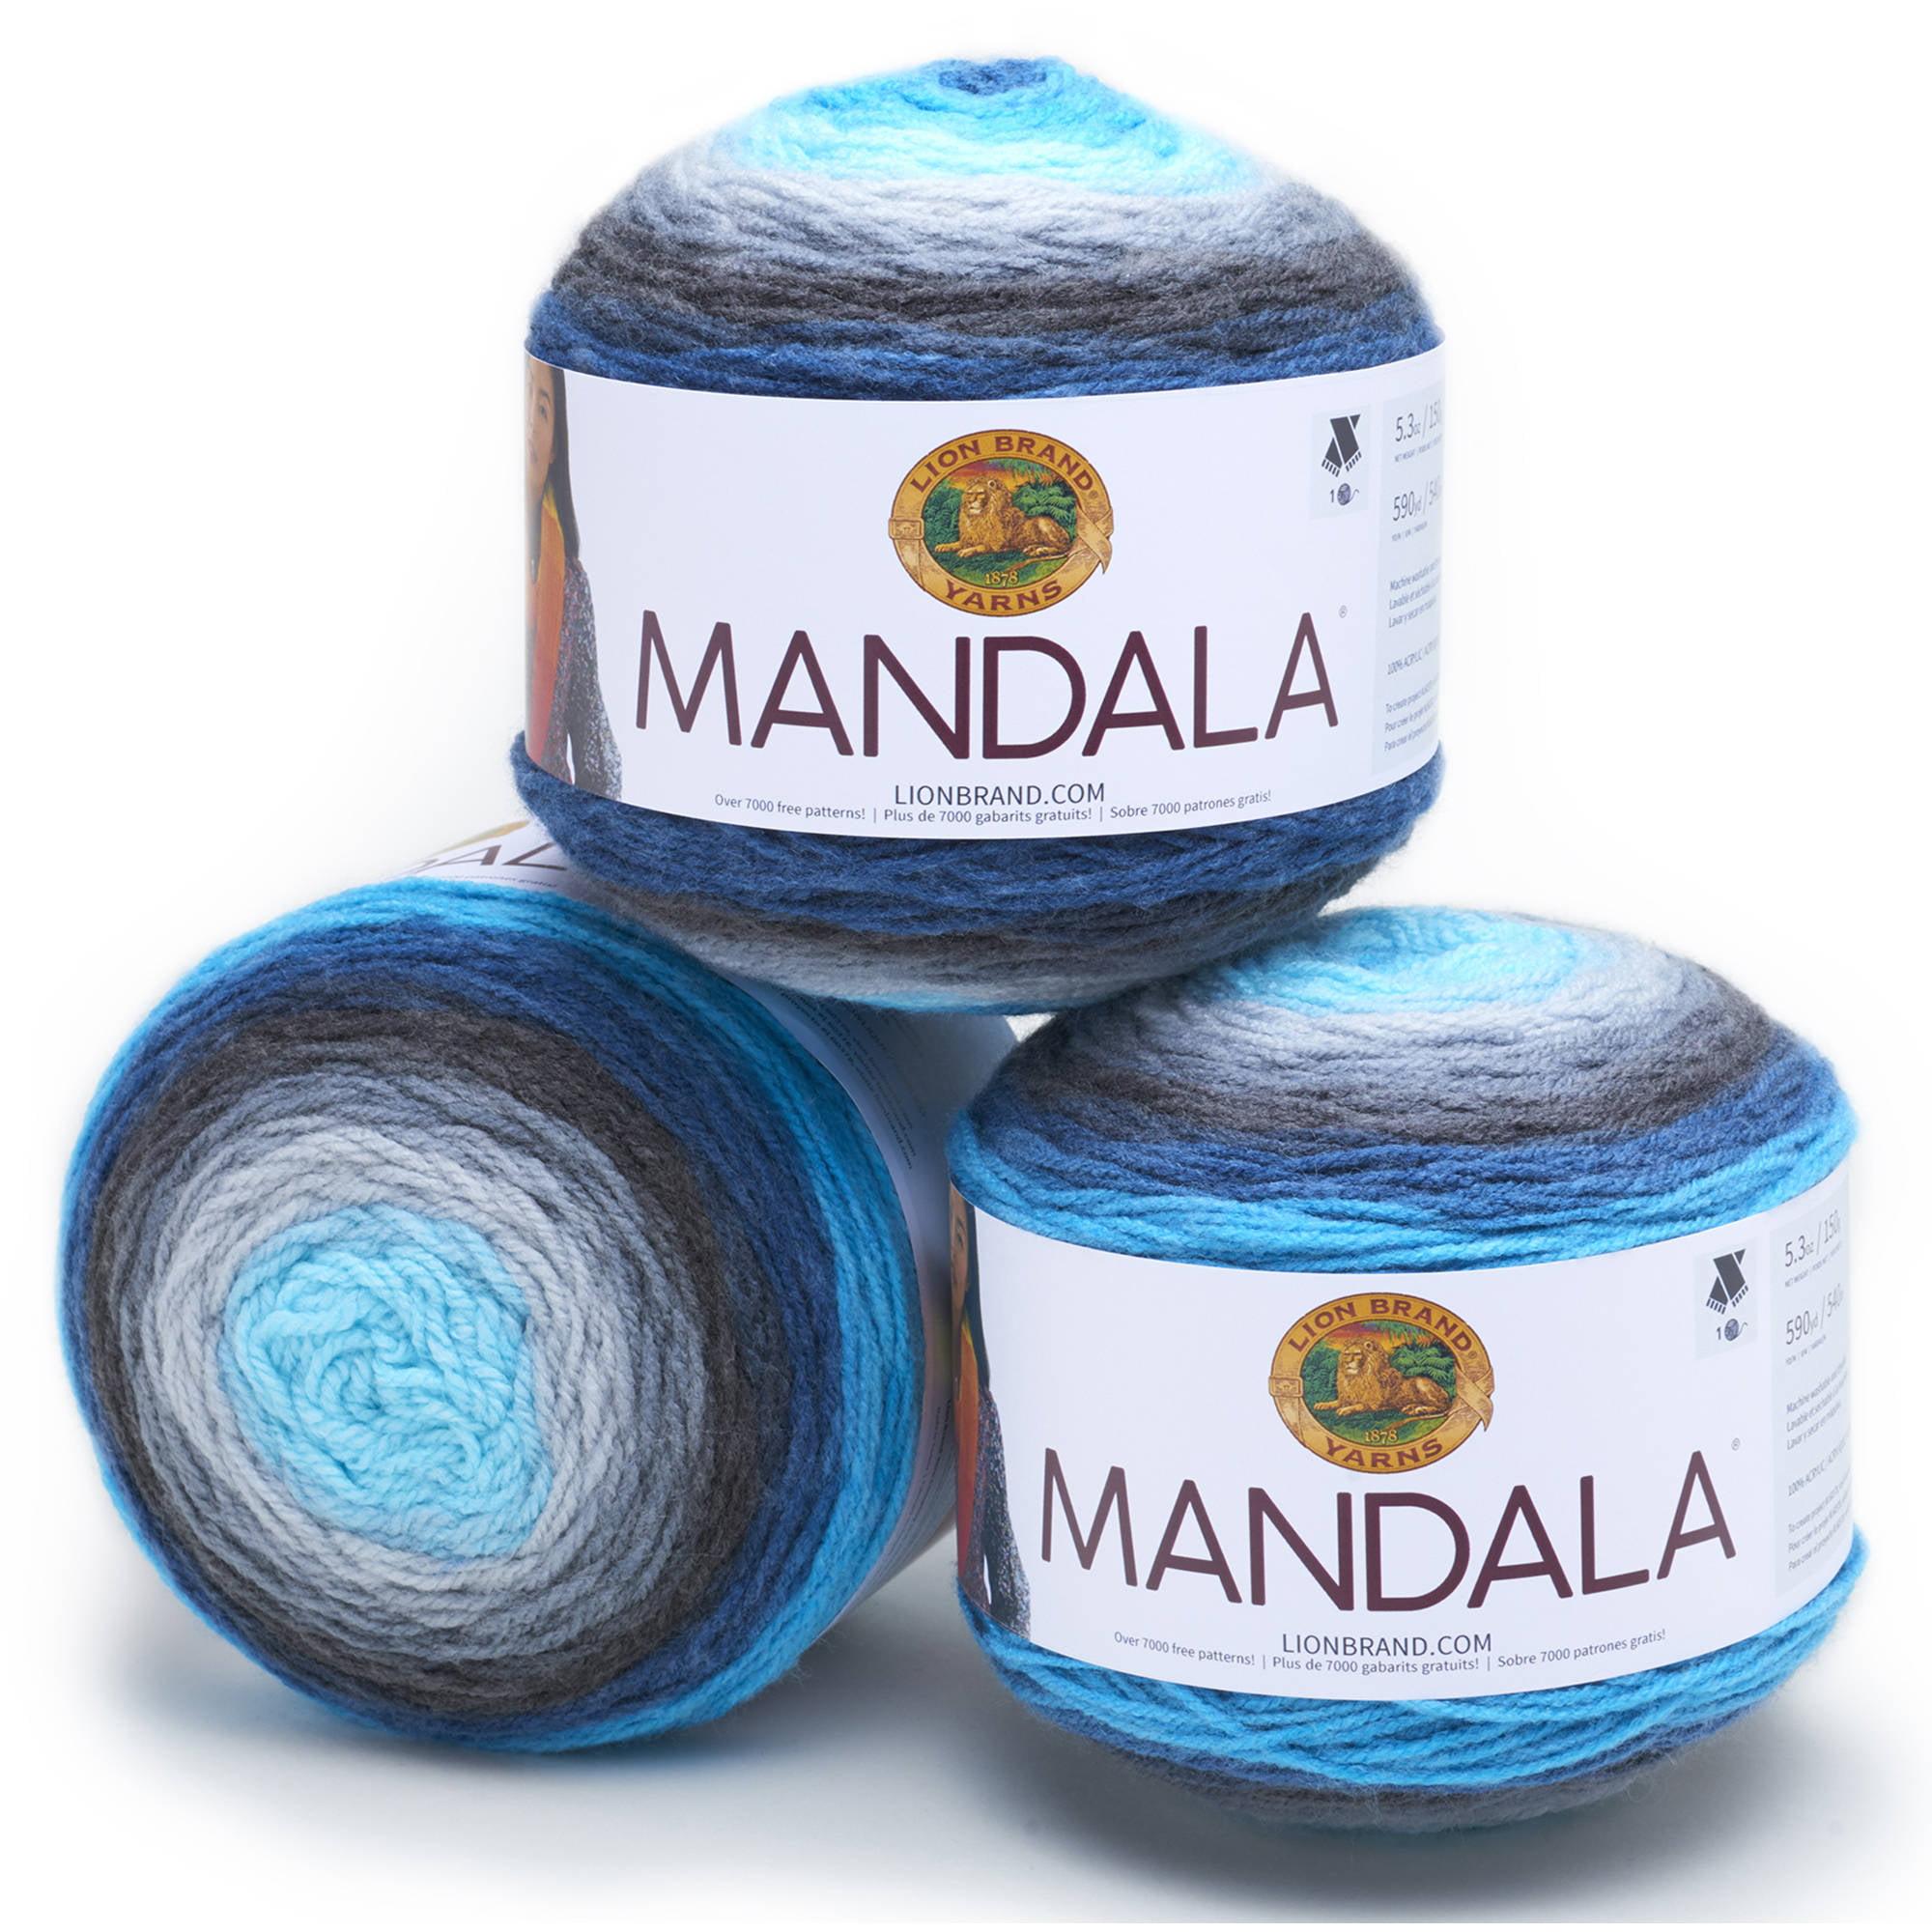 Lion Brand Yarn Mandala Classic Novelty Yarn, Pack of 3